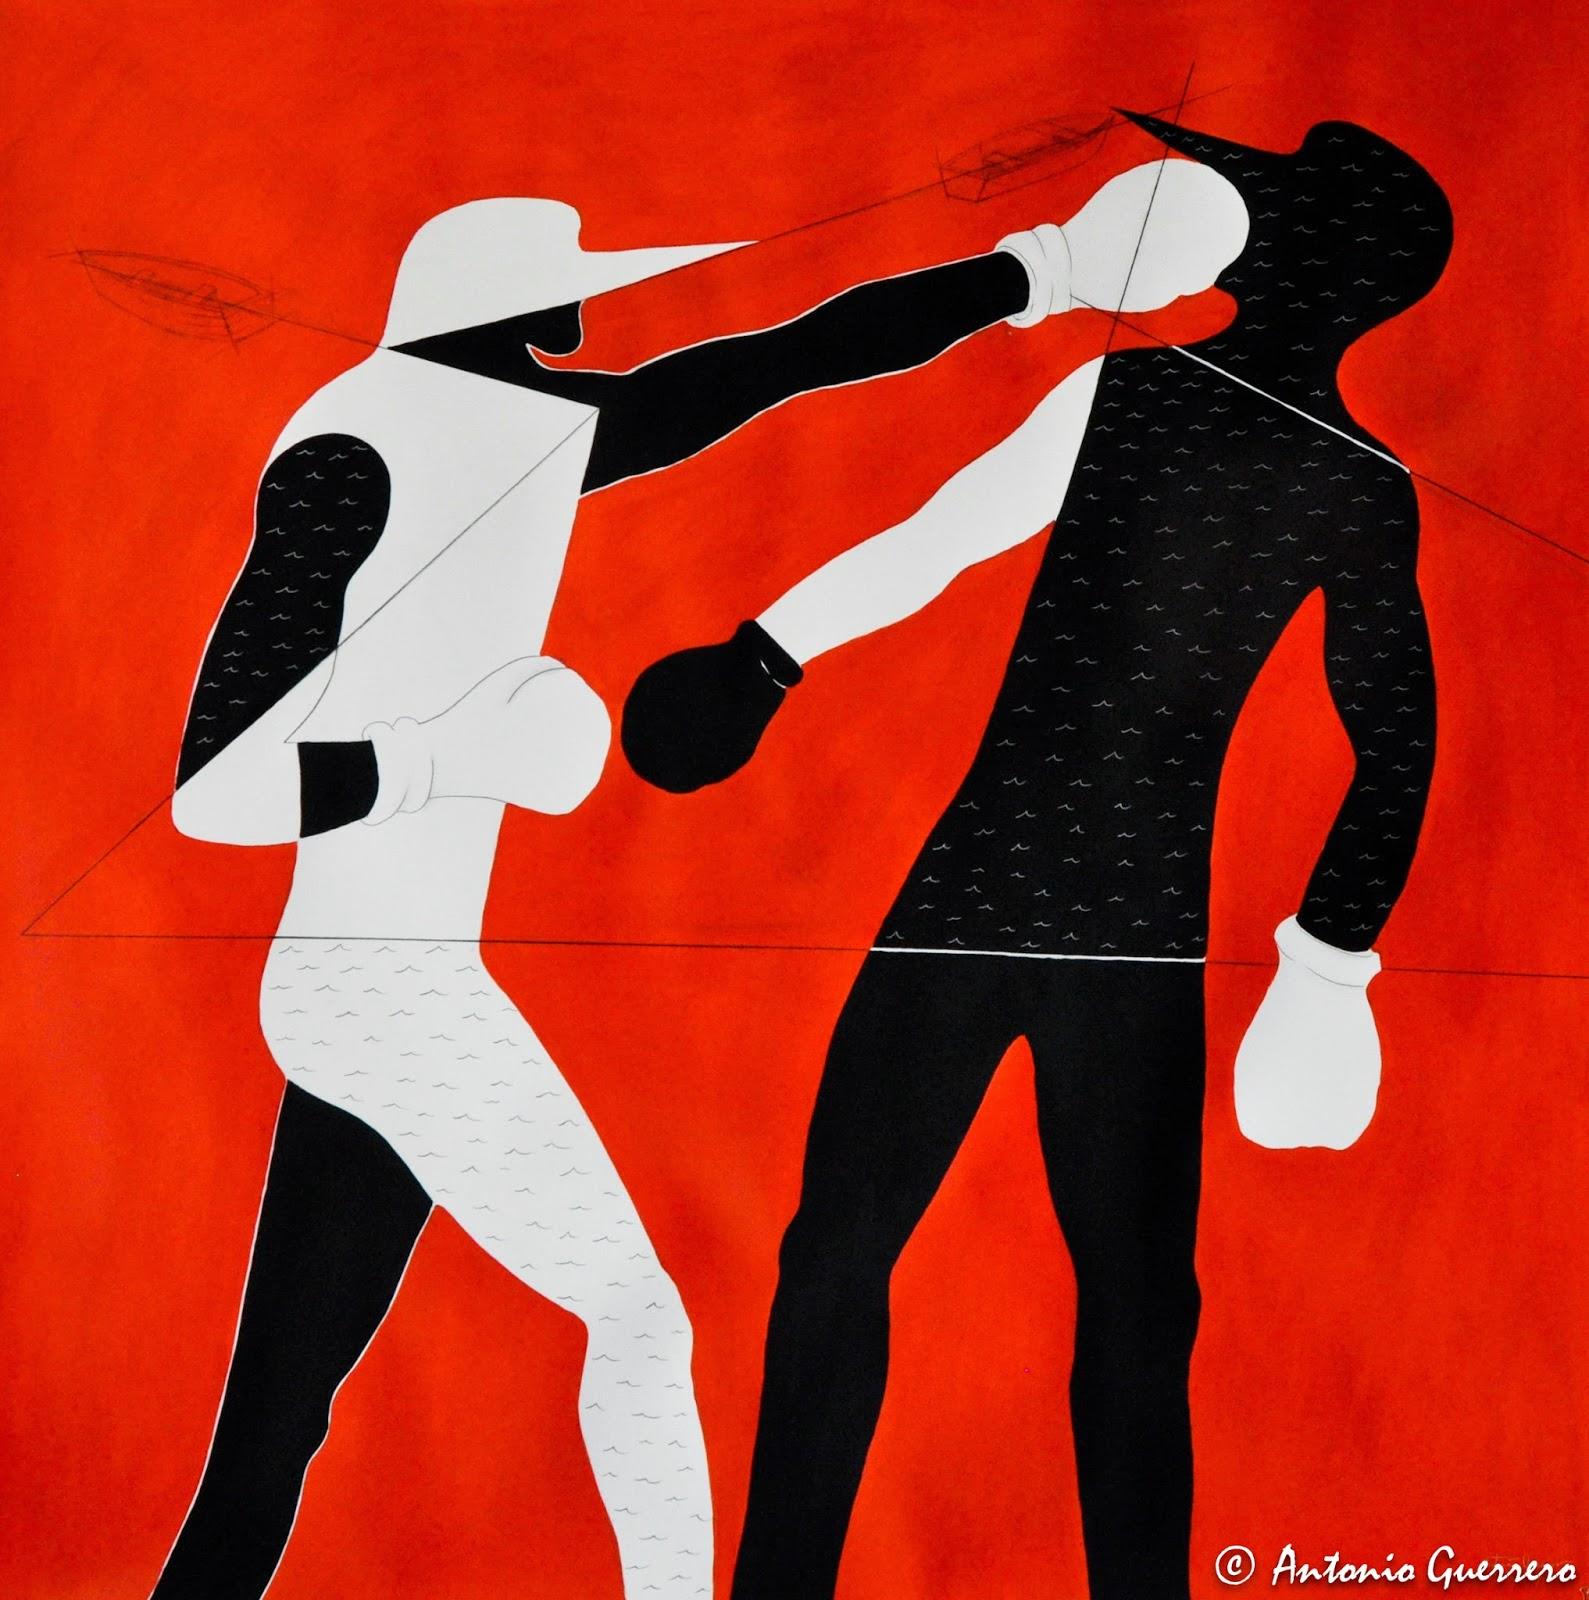 "Lee County Alliance for the Arts Presents: Antonio Guerrero ""Art vs Life"" 2/12/2016"